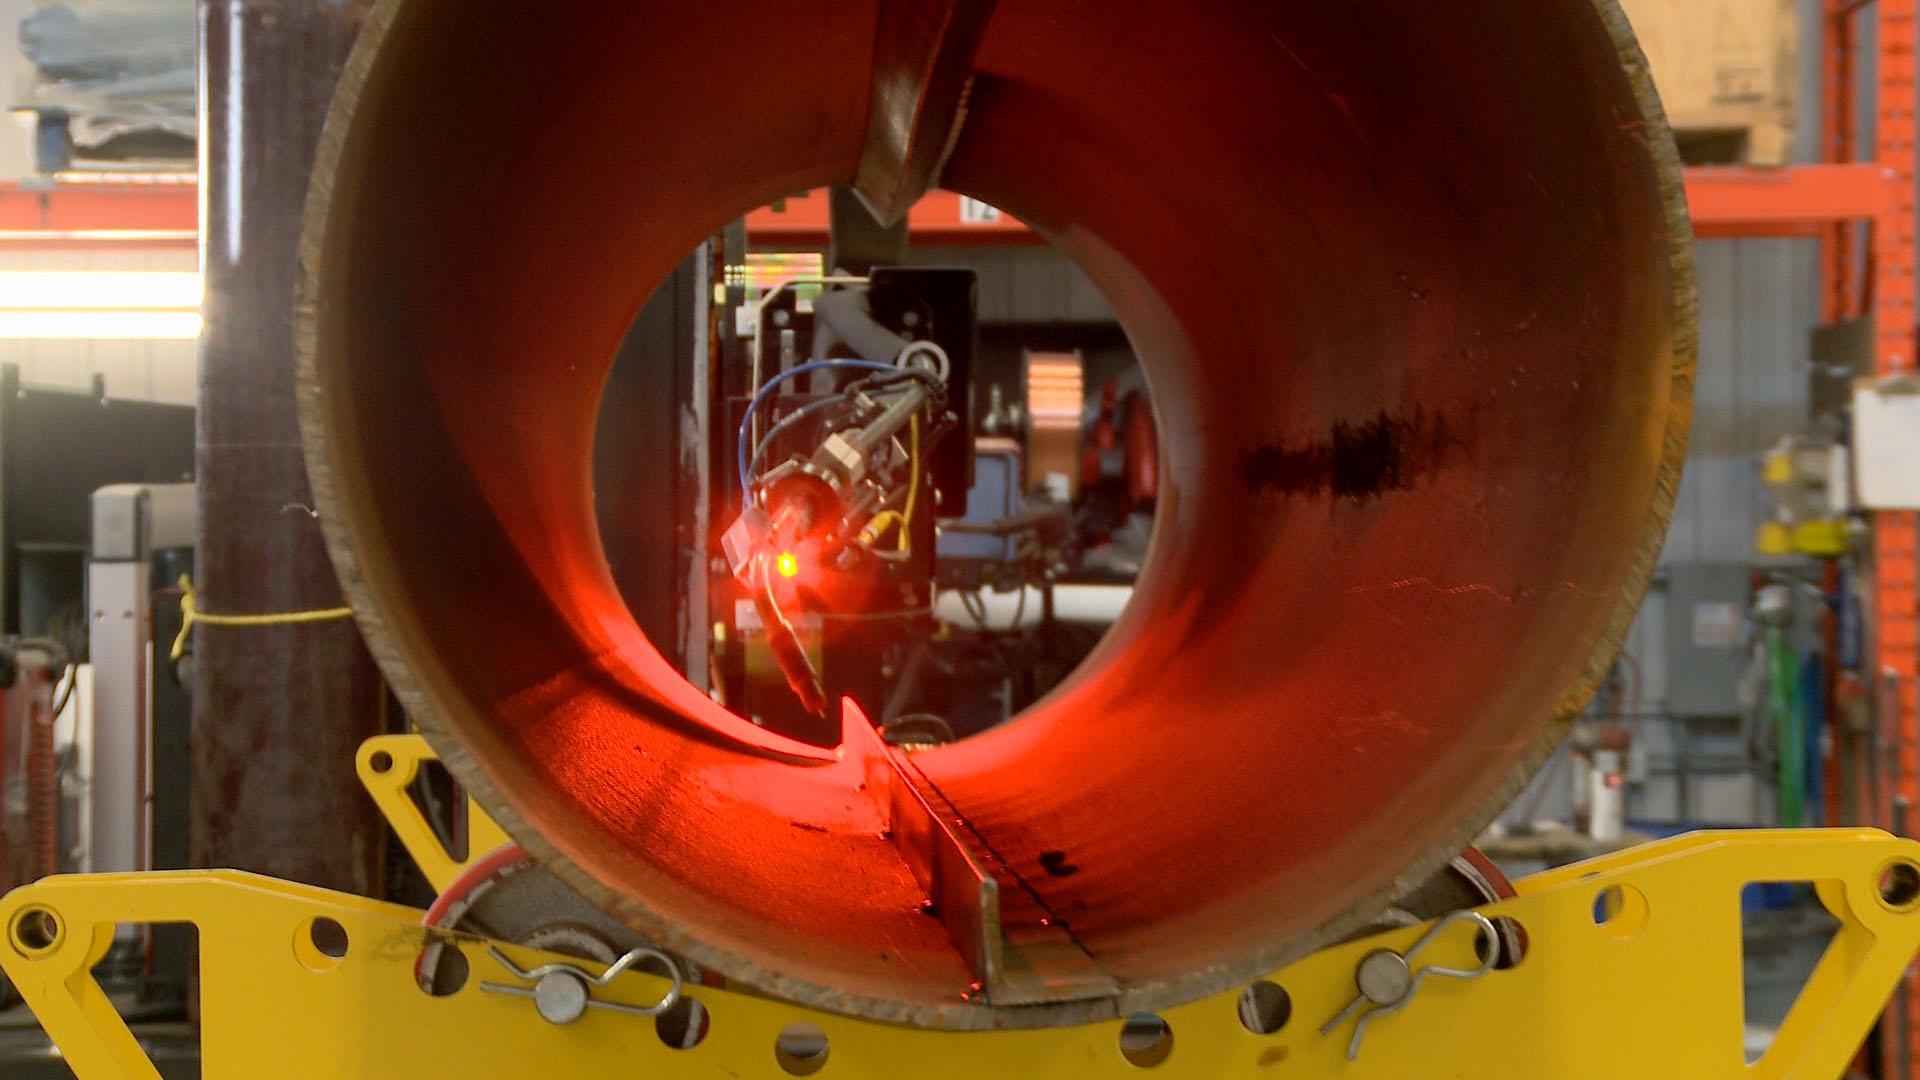 laser seam tracking on a column and boom manipulator.